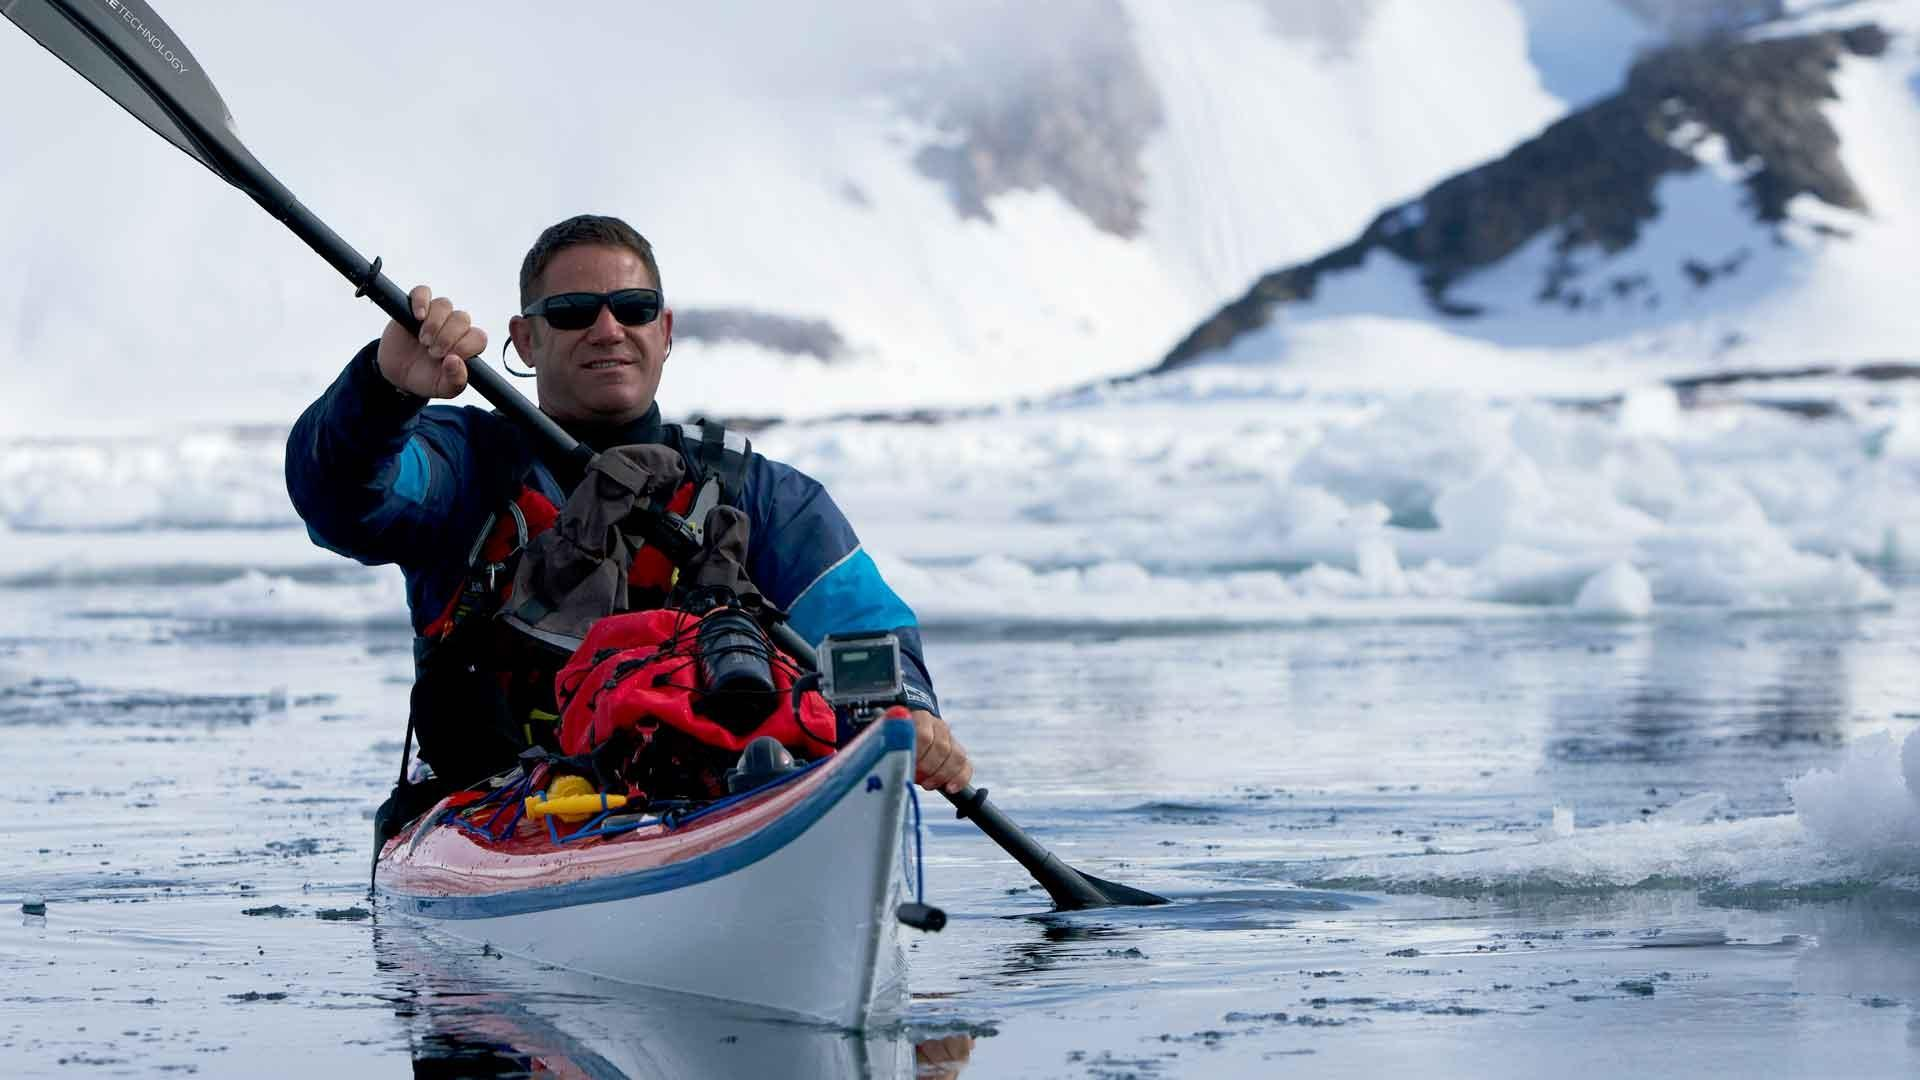 Episode 2 Preview | Greenland - Frozen Frontier